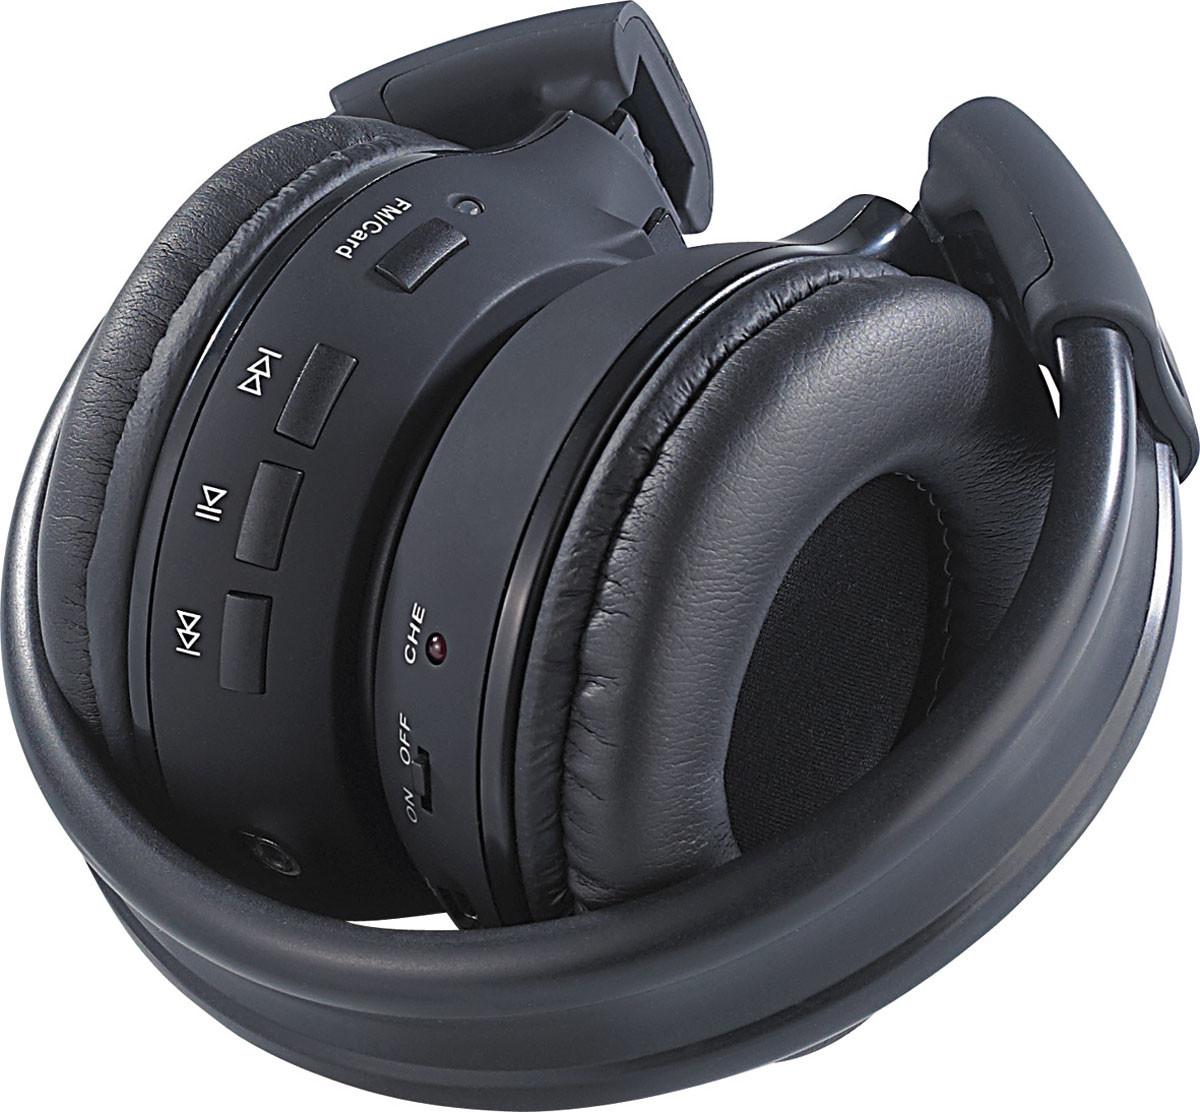 casque audio hi fi avec lecteur mp3 int gr 39 39 mph 232 sd. Black Bedroom Furniture Sets. Home Design Ideas